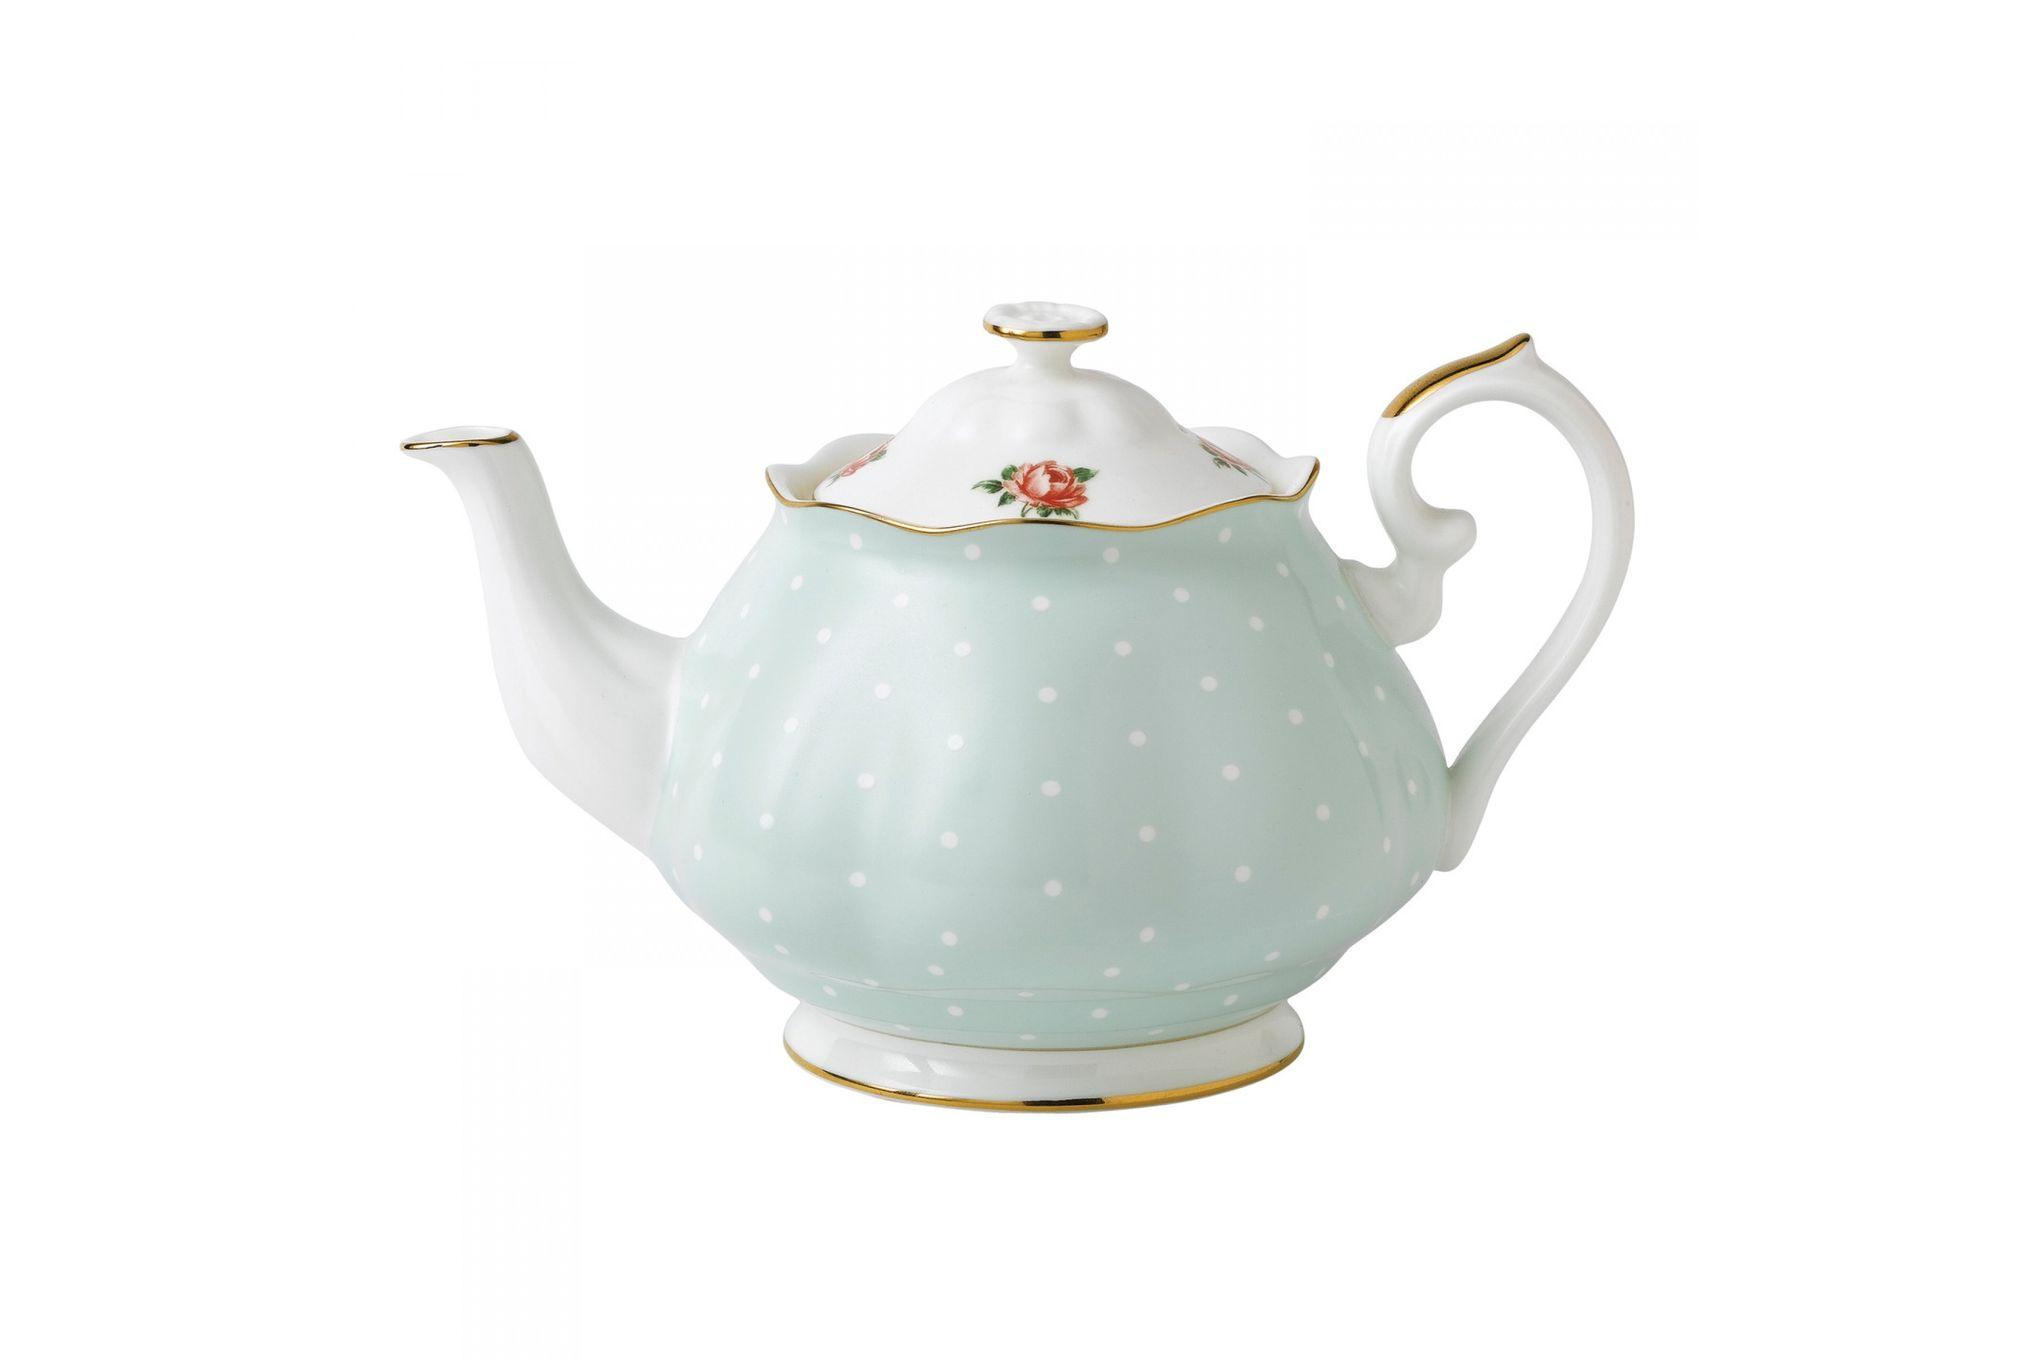 Royal Albert Polka Rose Teapot thumb 1